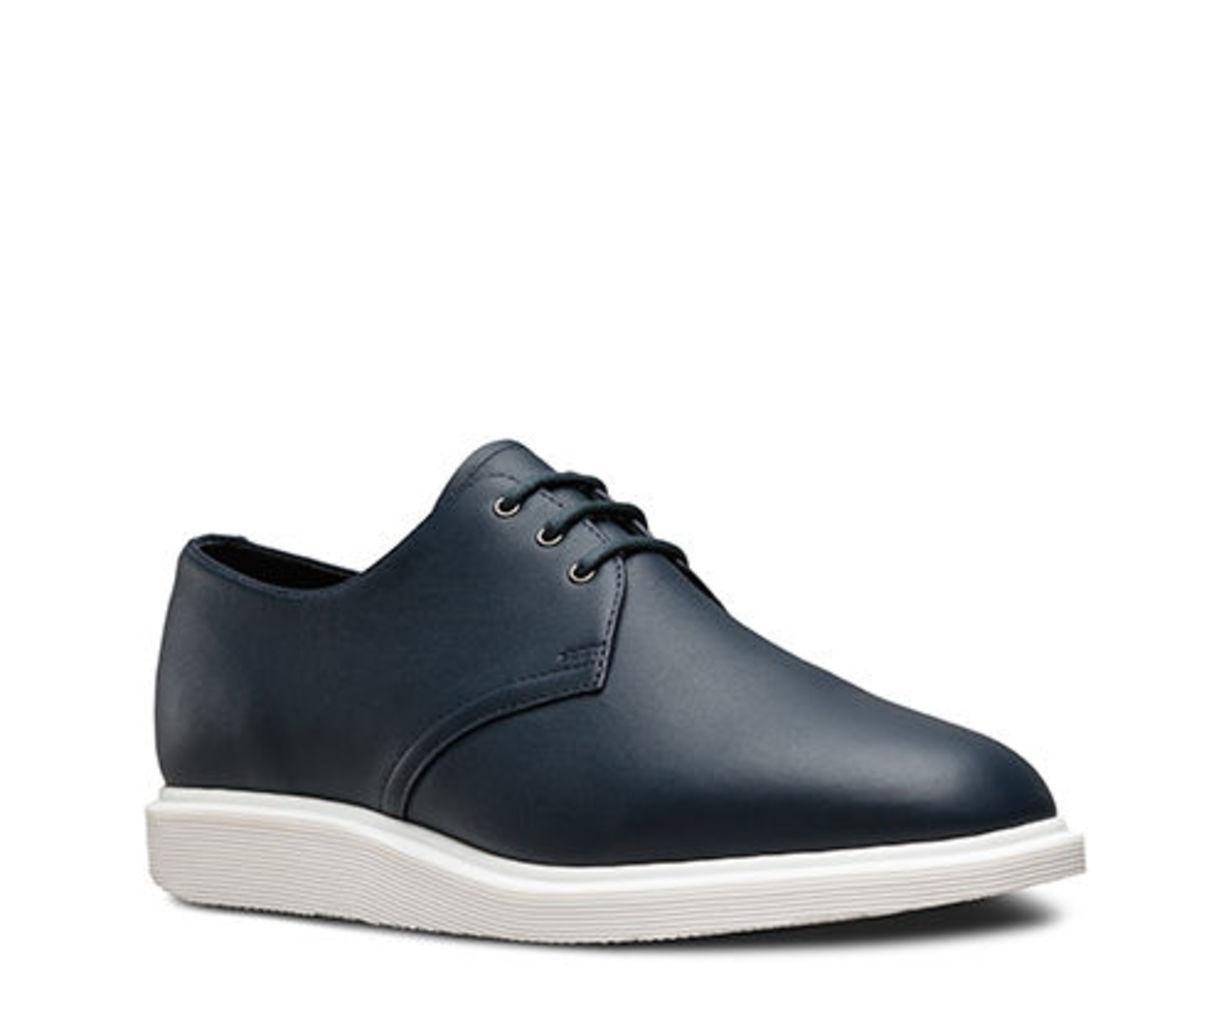 Torriano Shoe